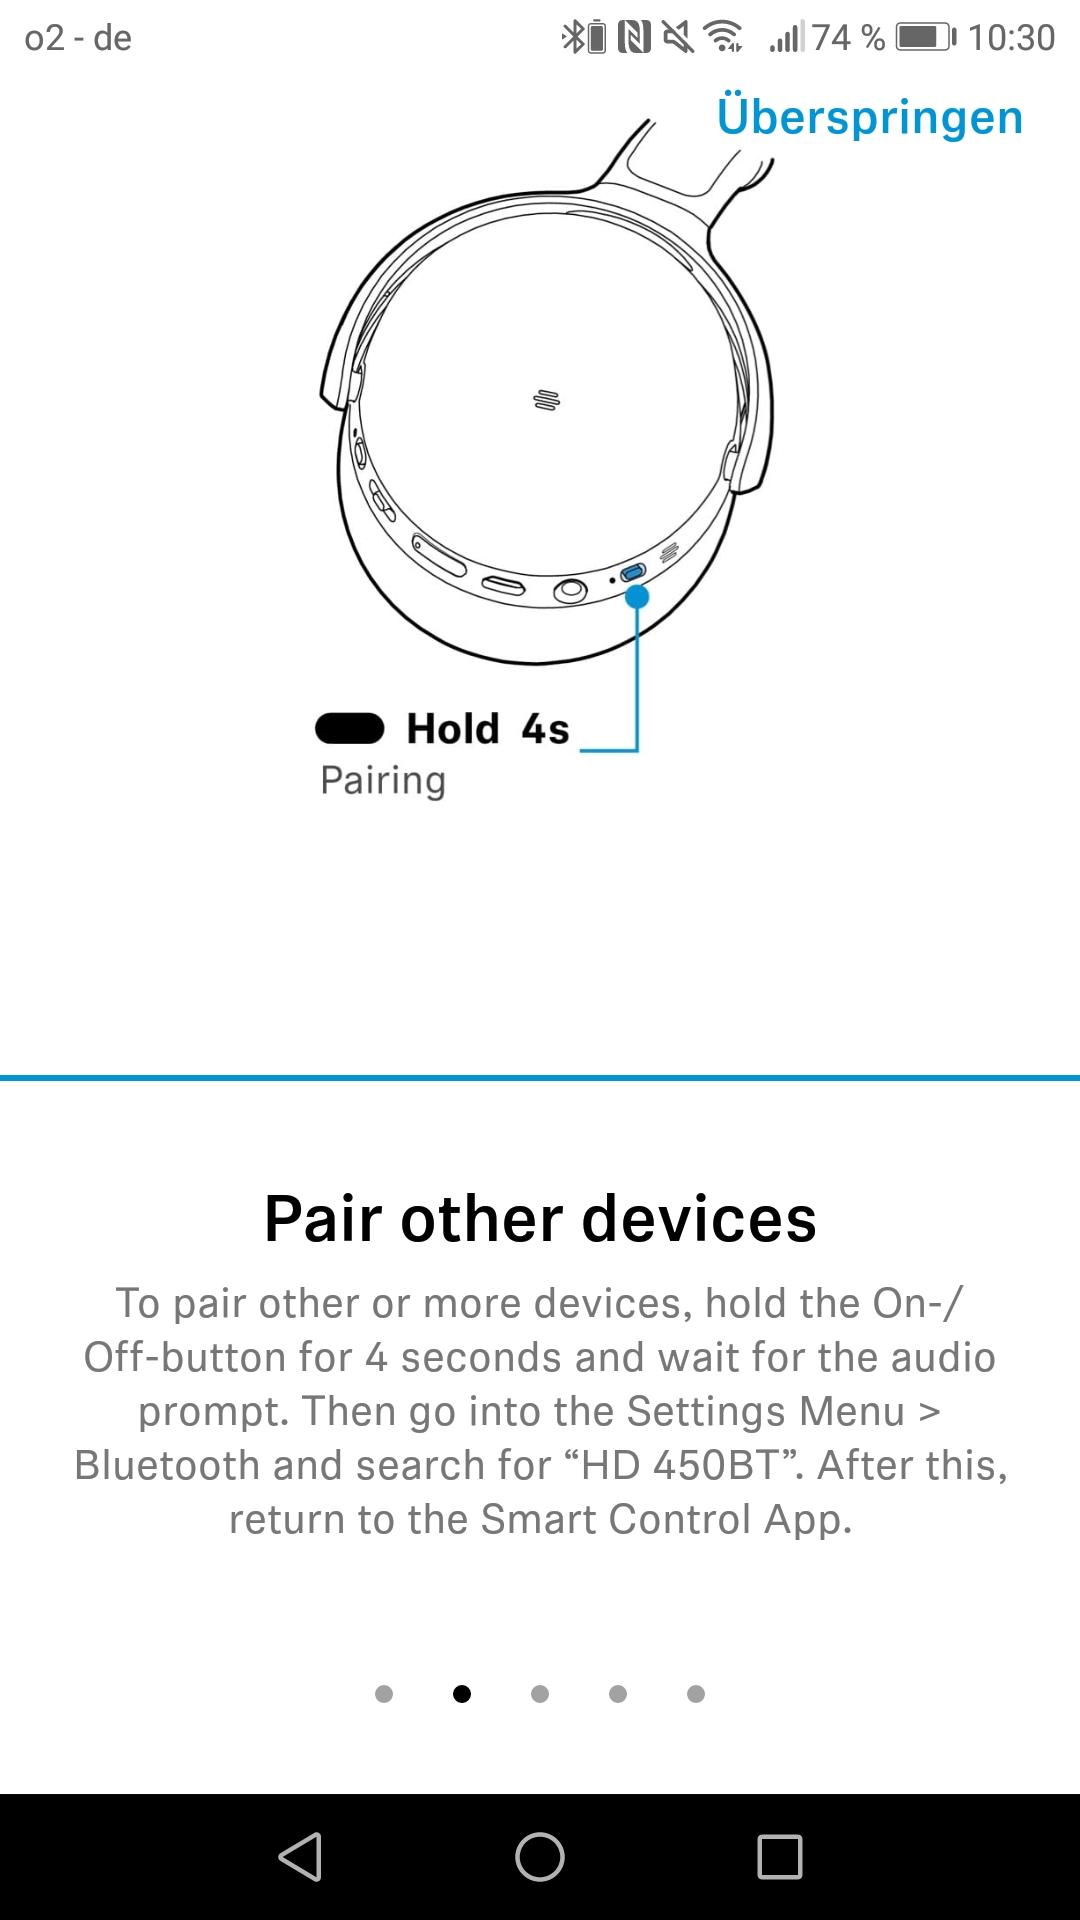 Bedienung Sennheiser HD 450BT Screenshot Pair other devices